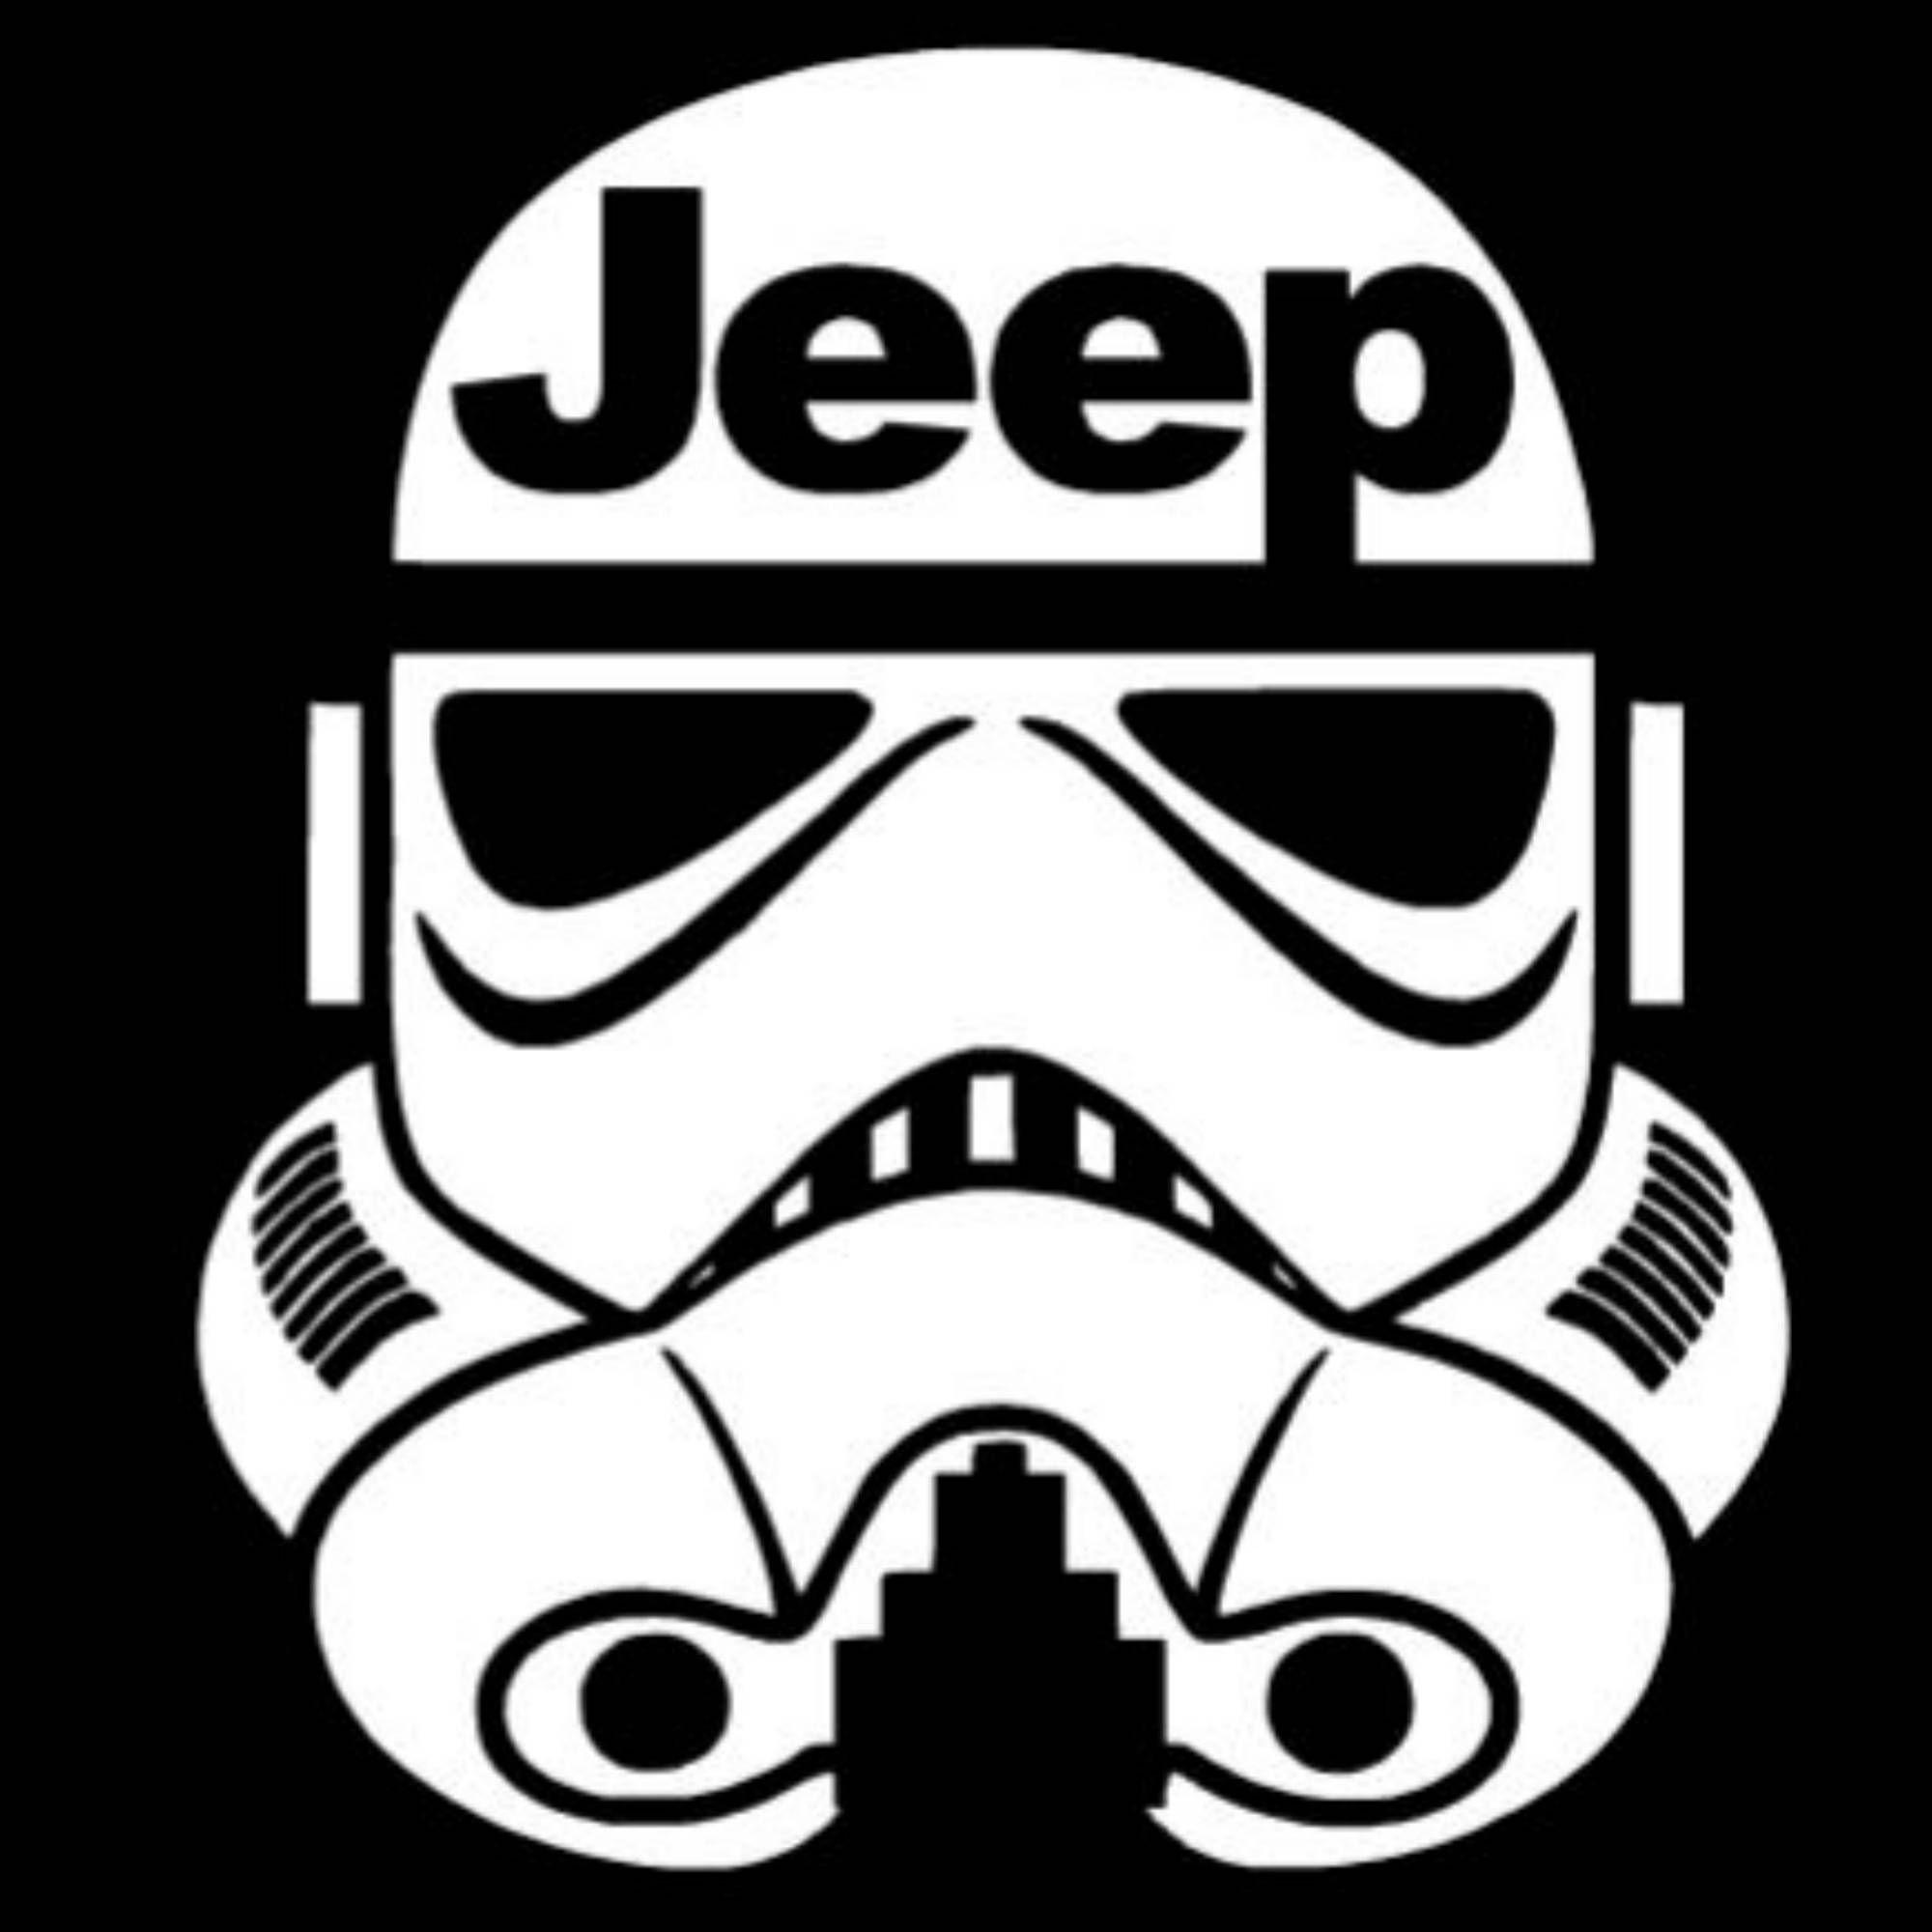 Star Wars Storm Trooper Jeep Decal Renegade Wrangler